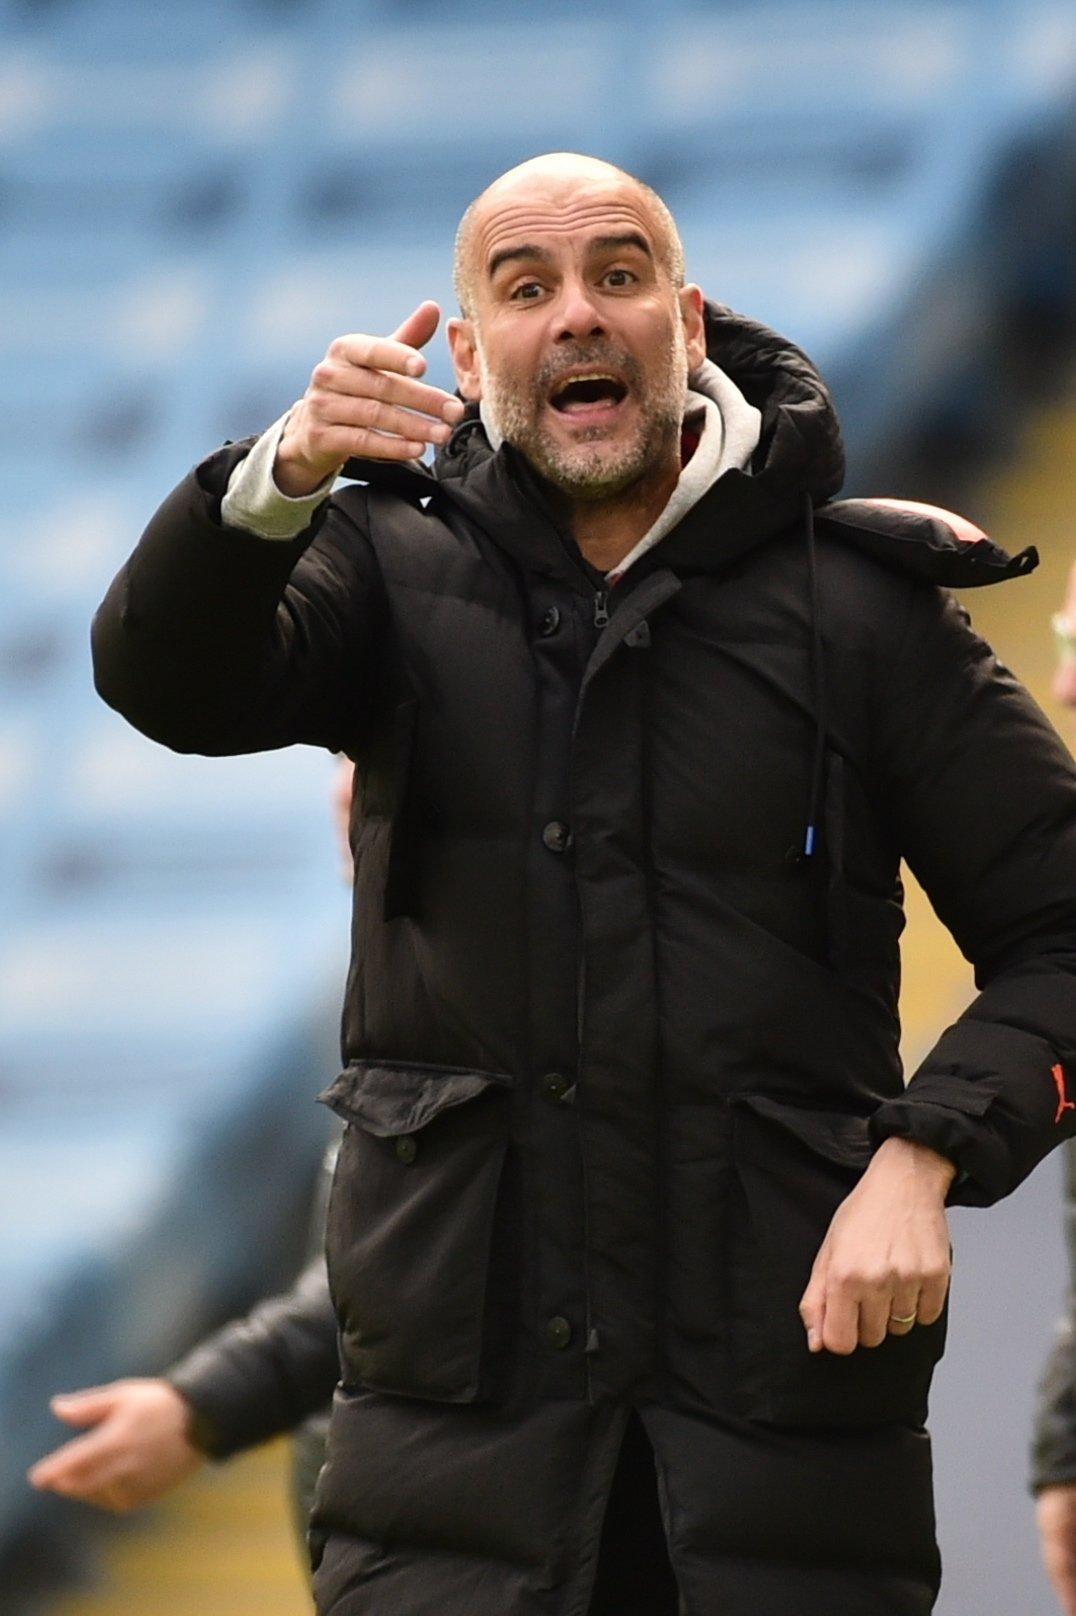 Manchester City manager Pep Guardiola gestures during a Premier League match against Leeds United, Manchester, Britain, April 10, 2021. (EPA Photo)